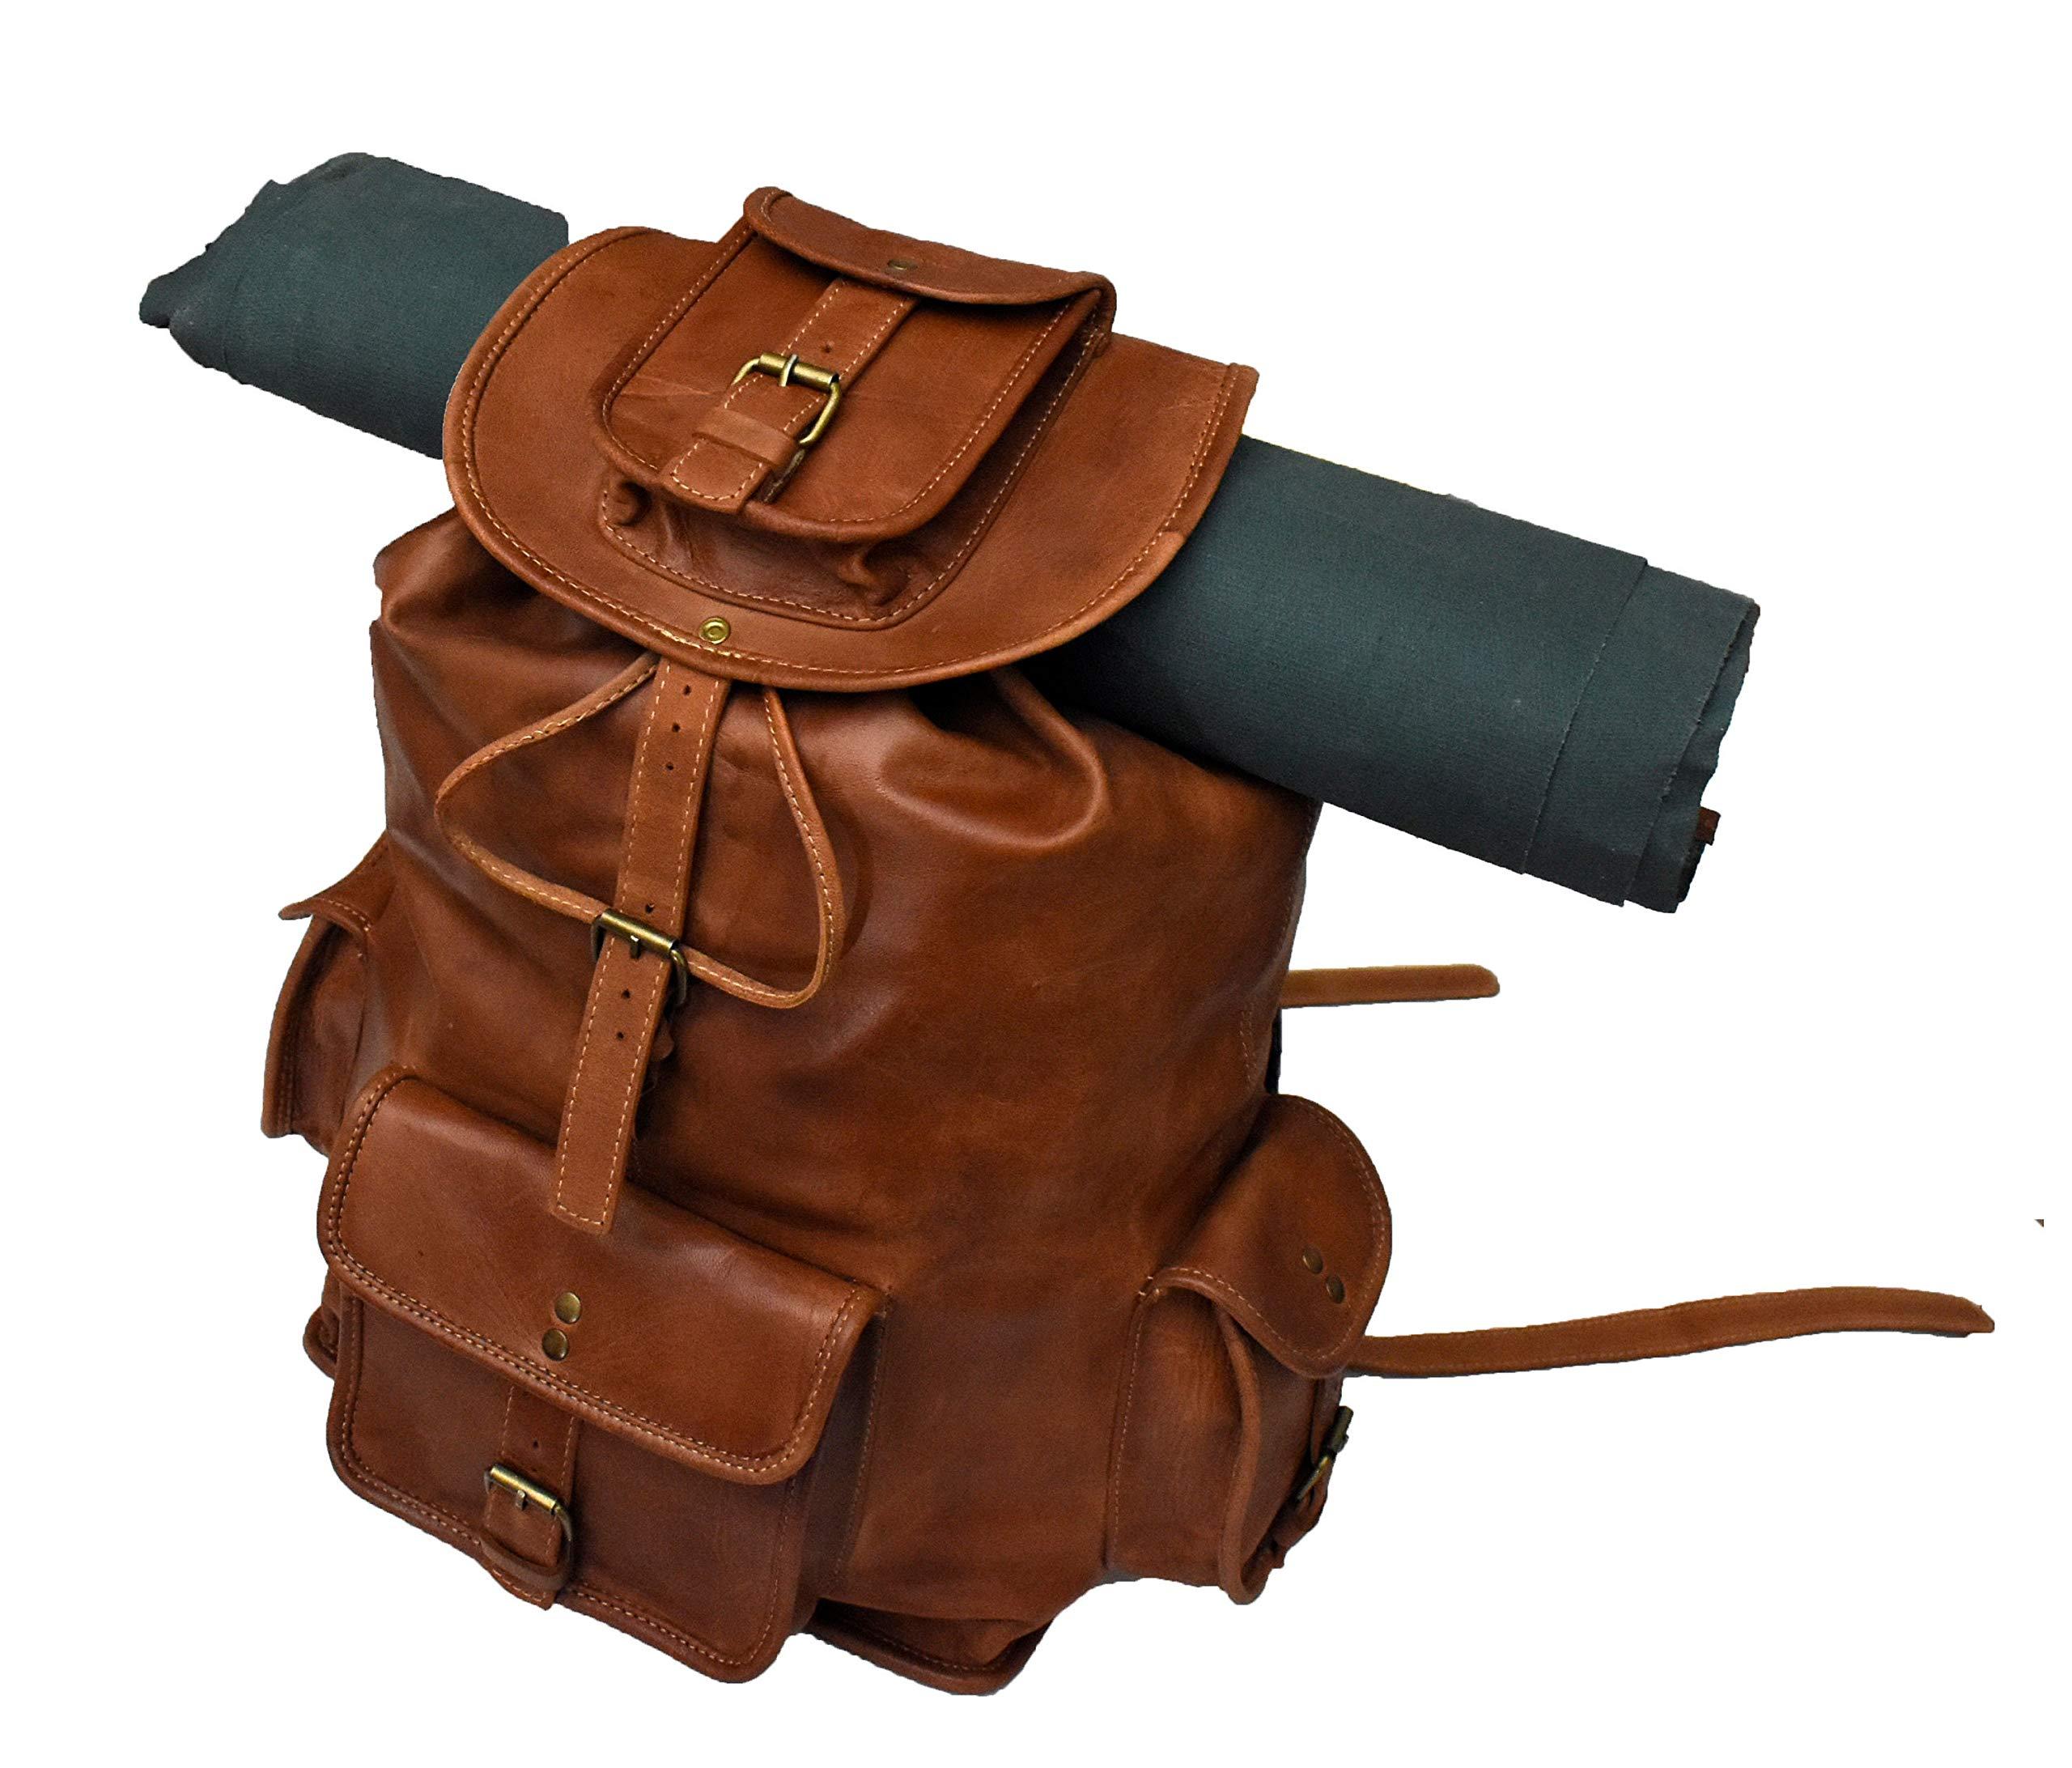 20'' Genuine Leather Retro Backpack Bag, Picnic Bag Travel Rucksack by handolederco.